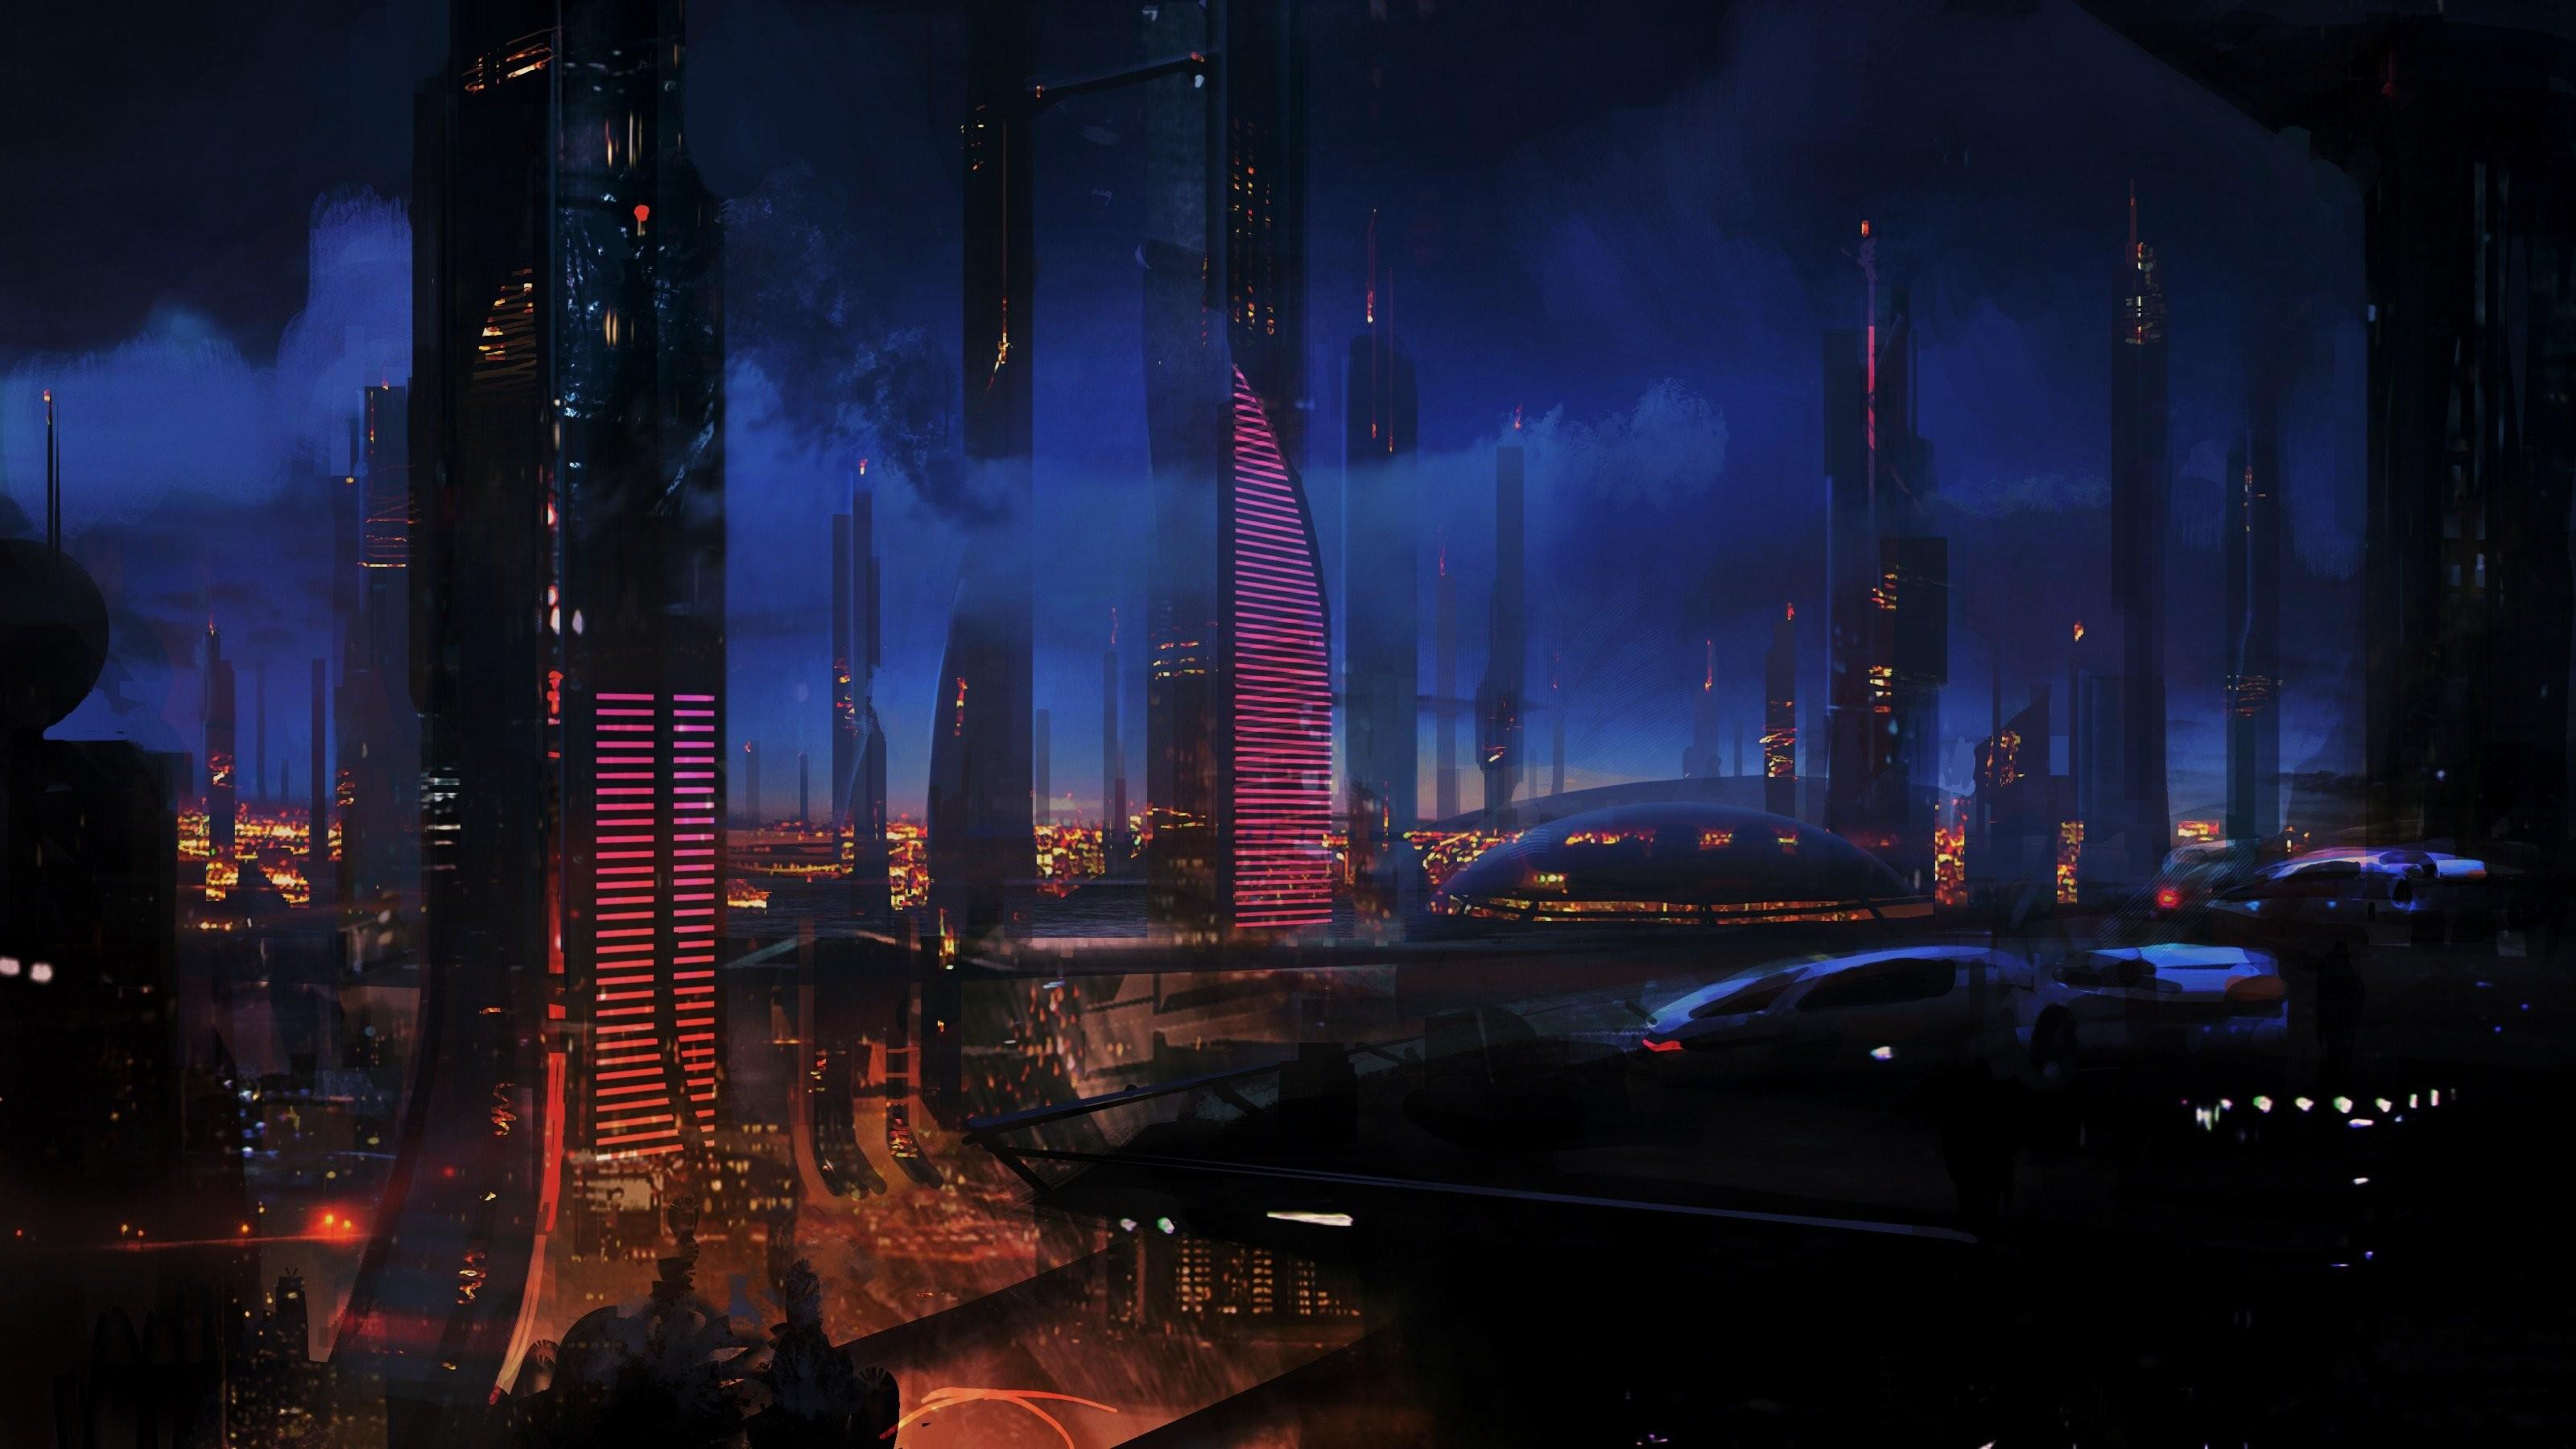 City Lights Futuristic Mass Effect Night Sci-fi